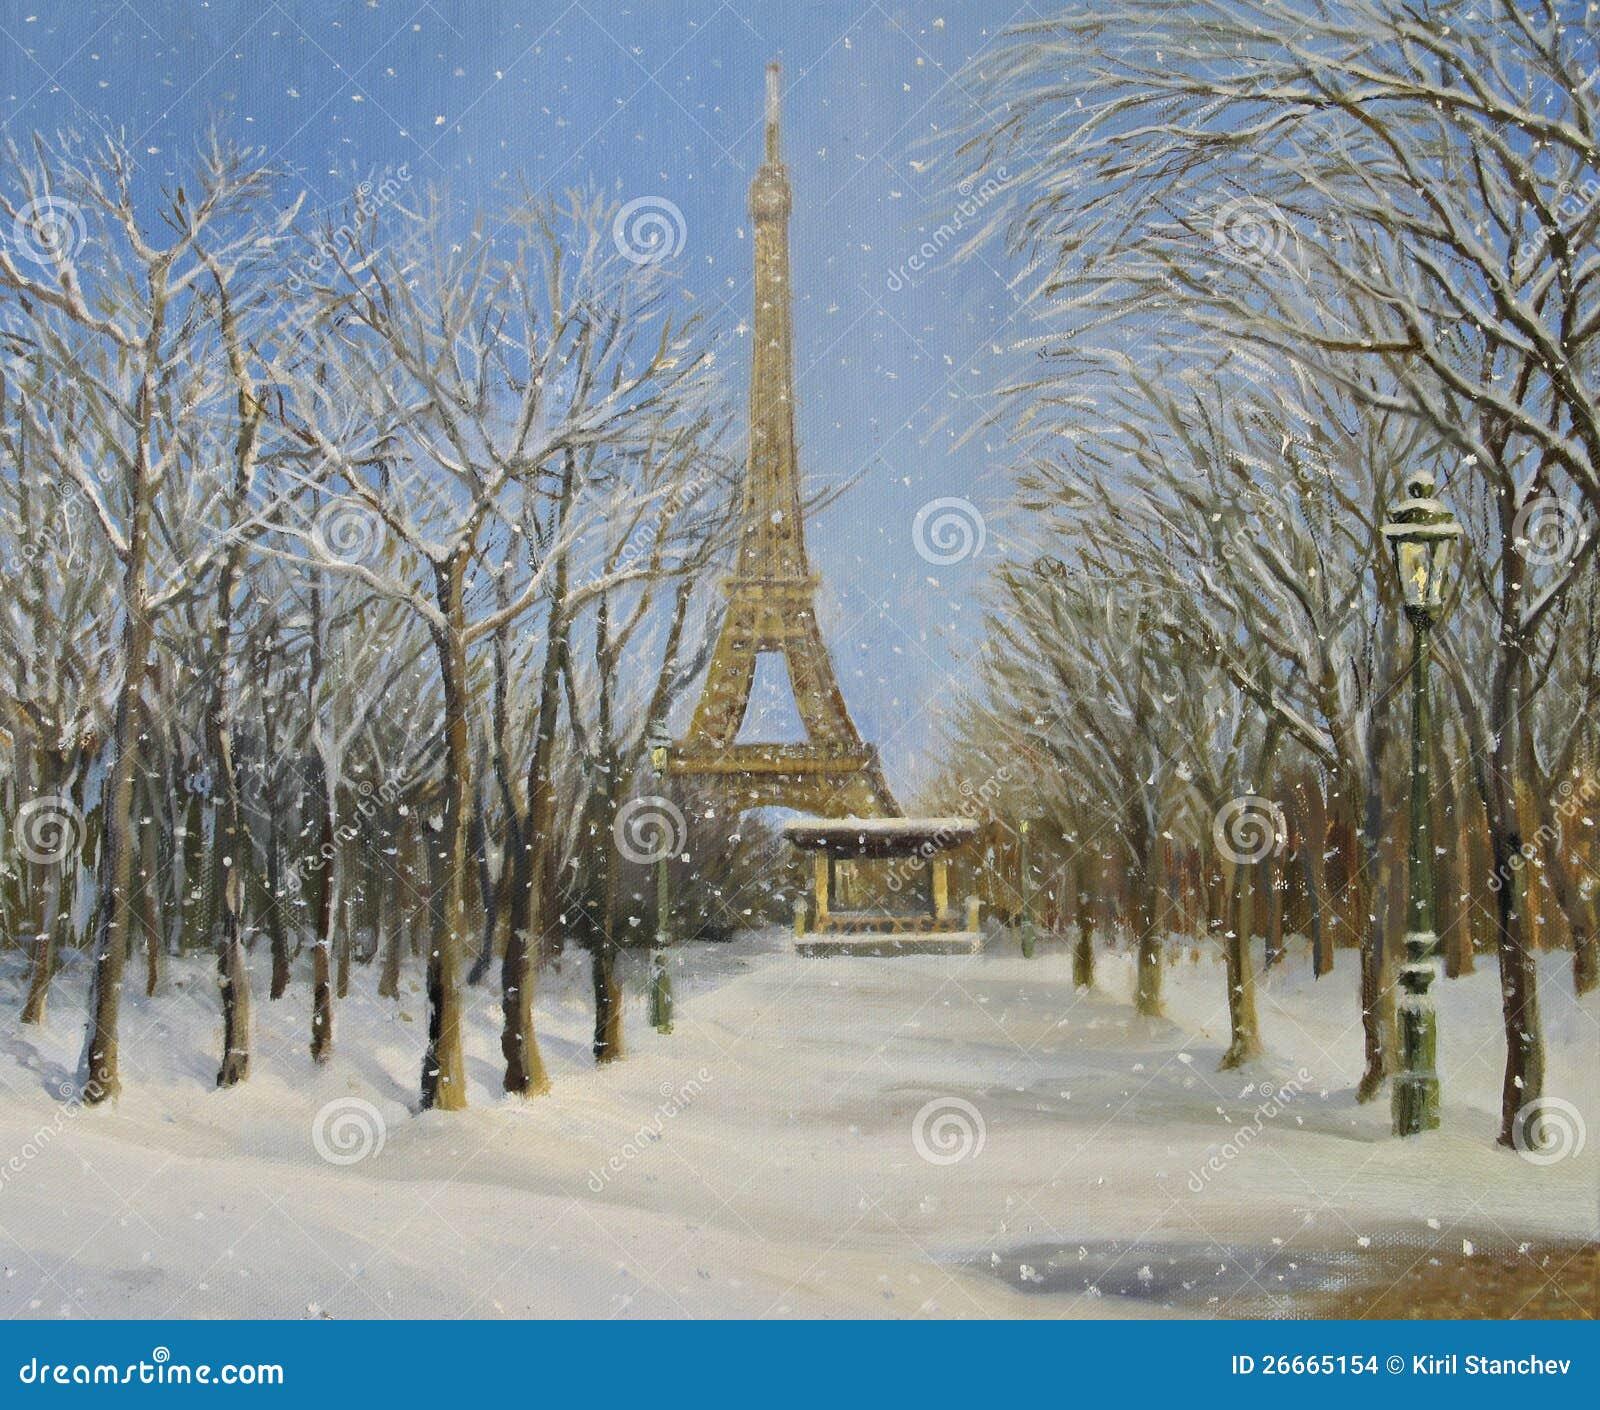 Winter in paris stock images image 26665154 - Landscaping parijs ...